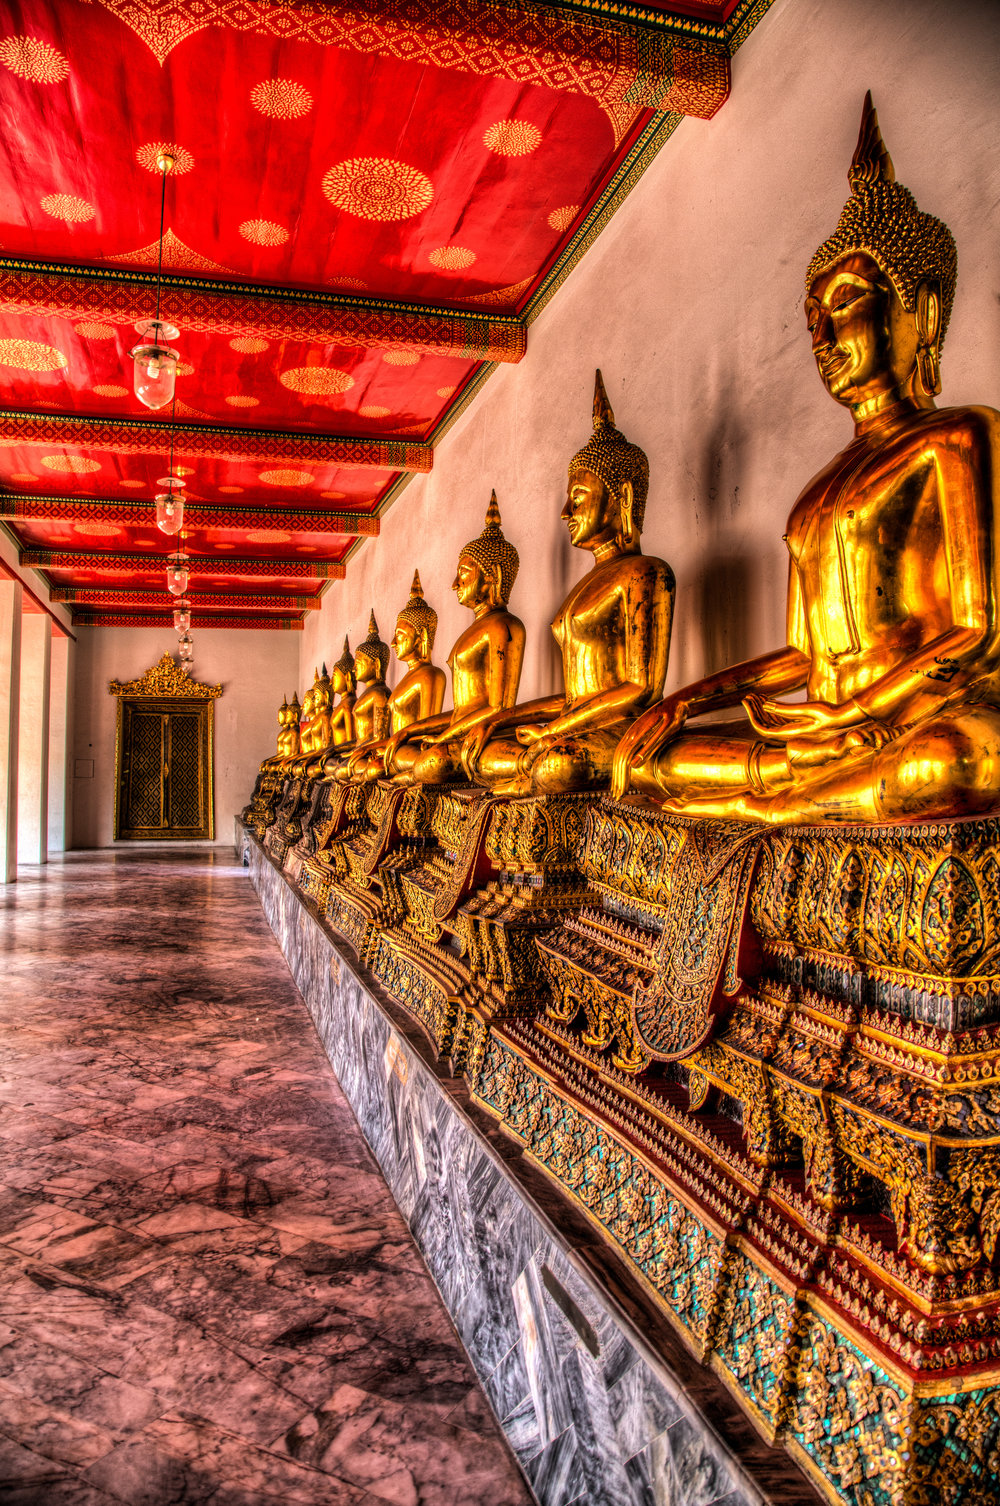 The Hall of Buddhas